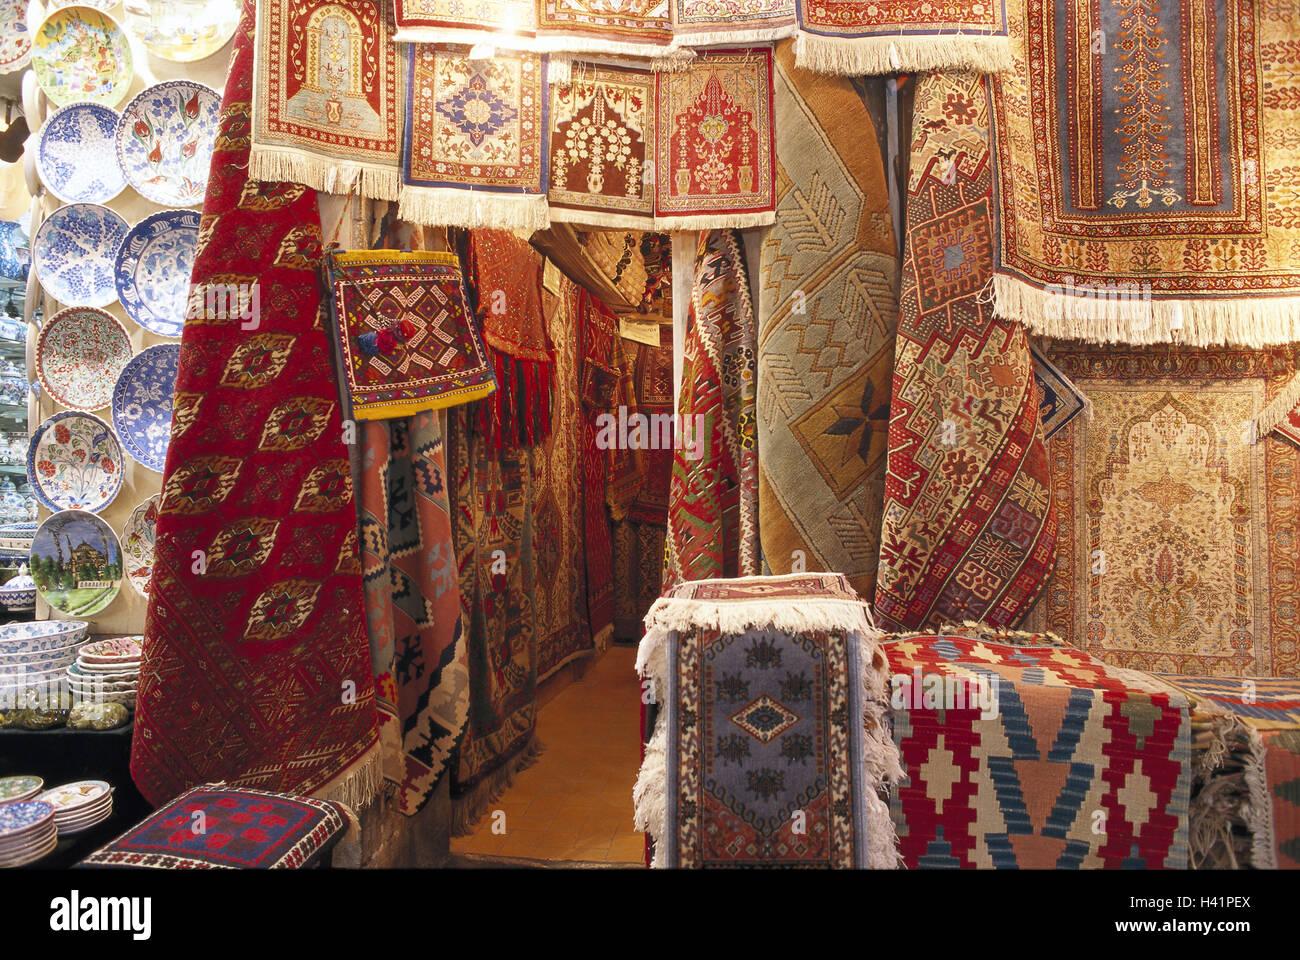 Teppichhändler  Türkei, Istanbul, großer Basar, Teppich-Geschäft, Ausstellung ...